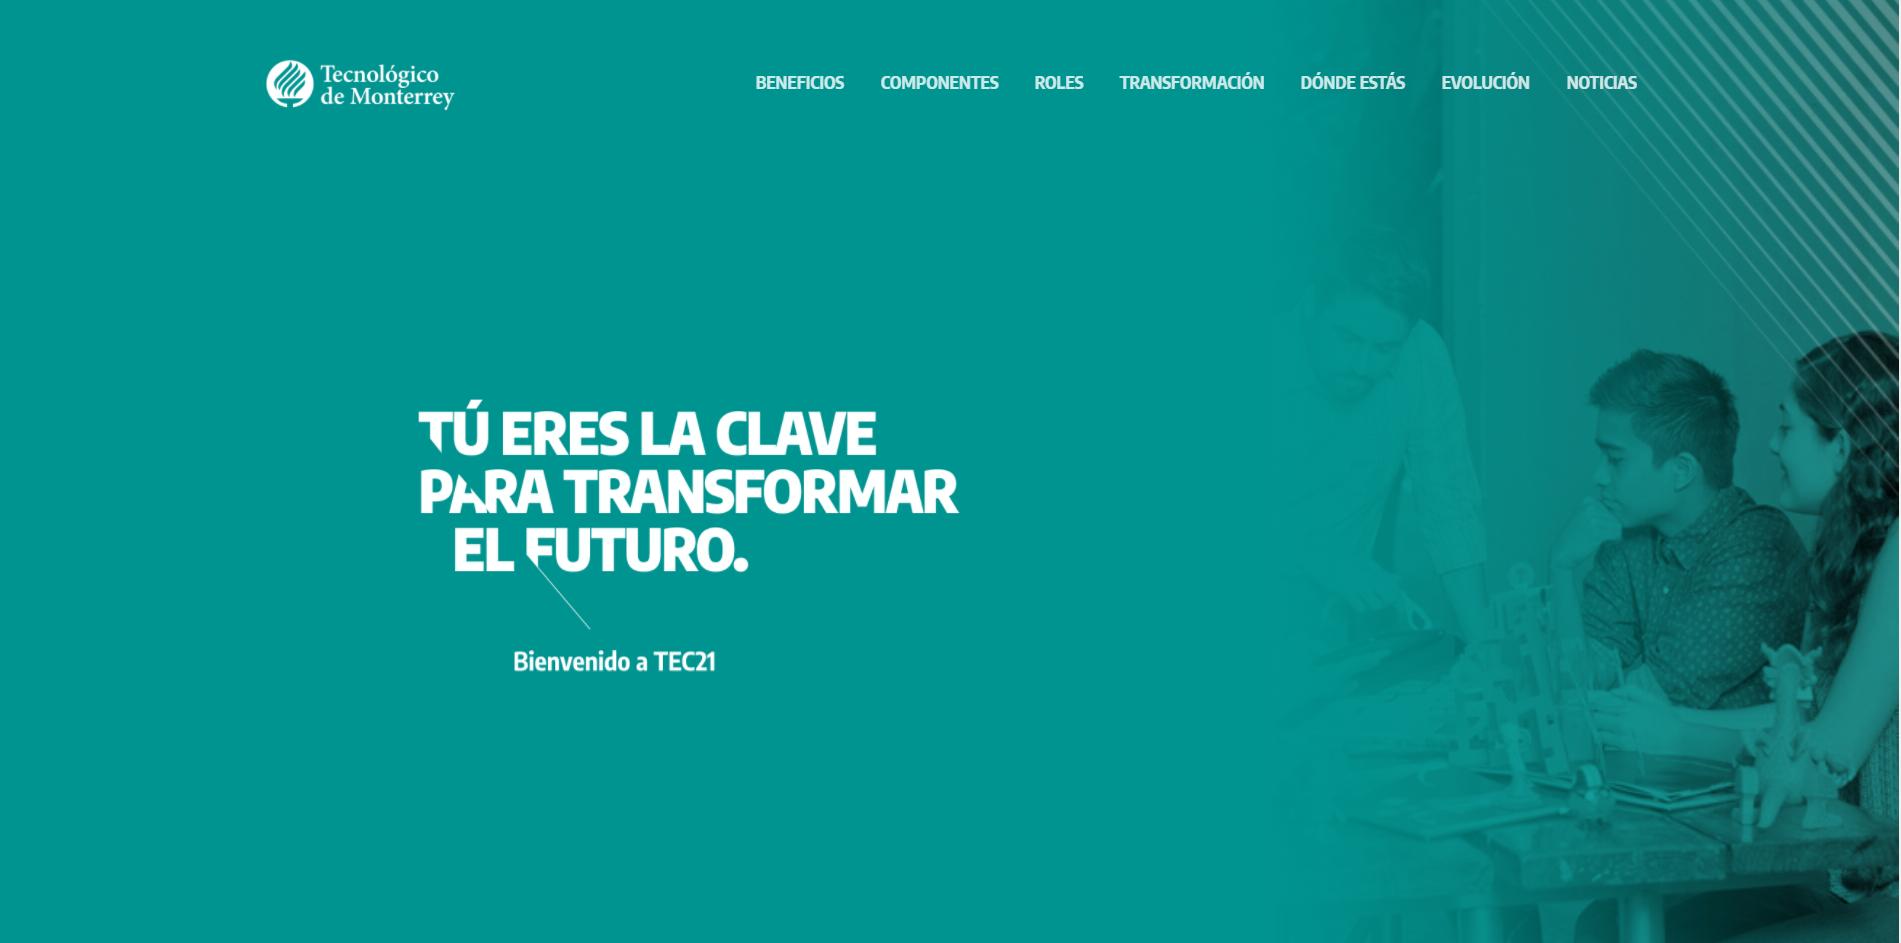 Monterrey enhance your Drupal experience